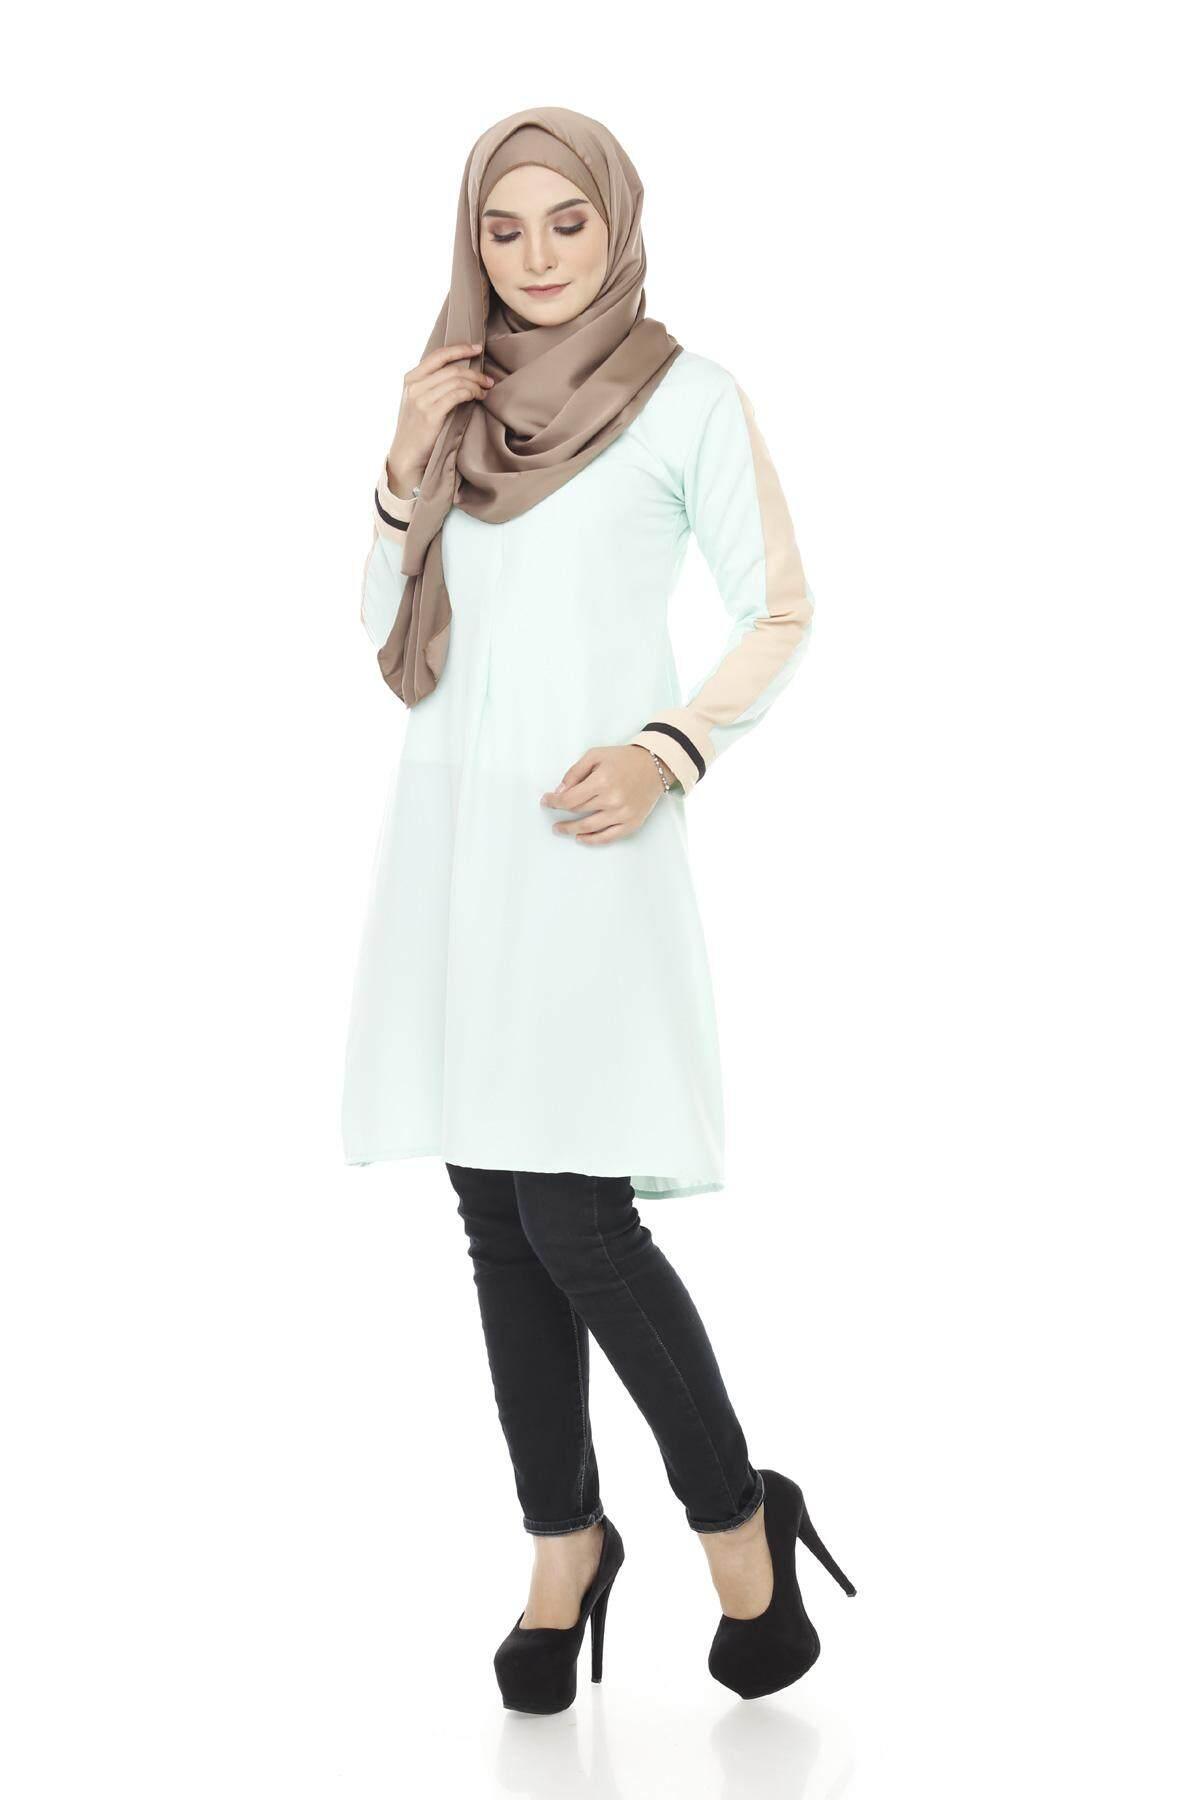 Frazi Blouse / Muslimah Blouse / Muslim Women Blouse / Fashion Blouse / Knee Length Blouse (S-XL)